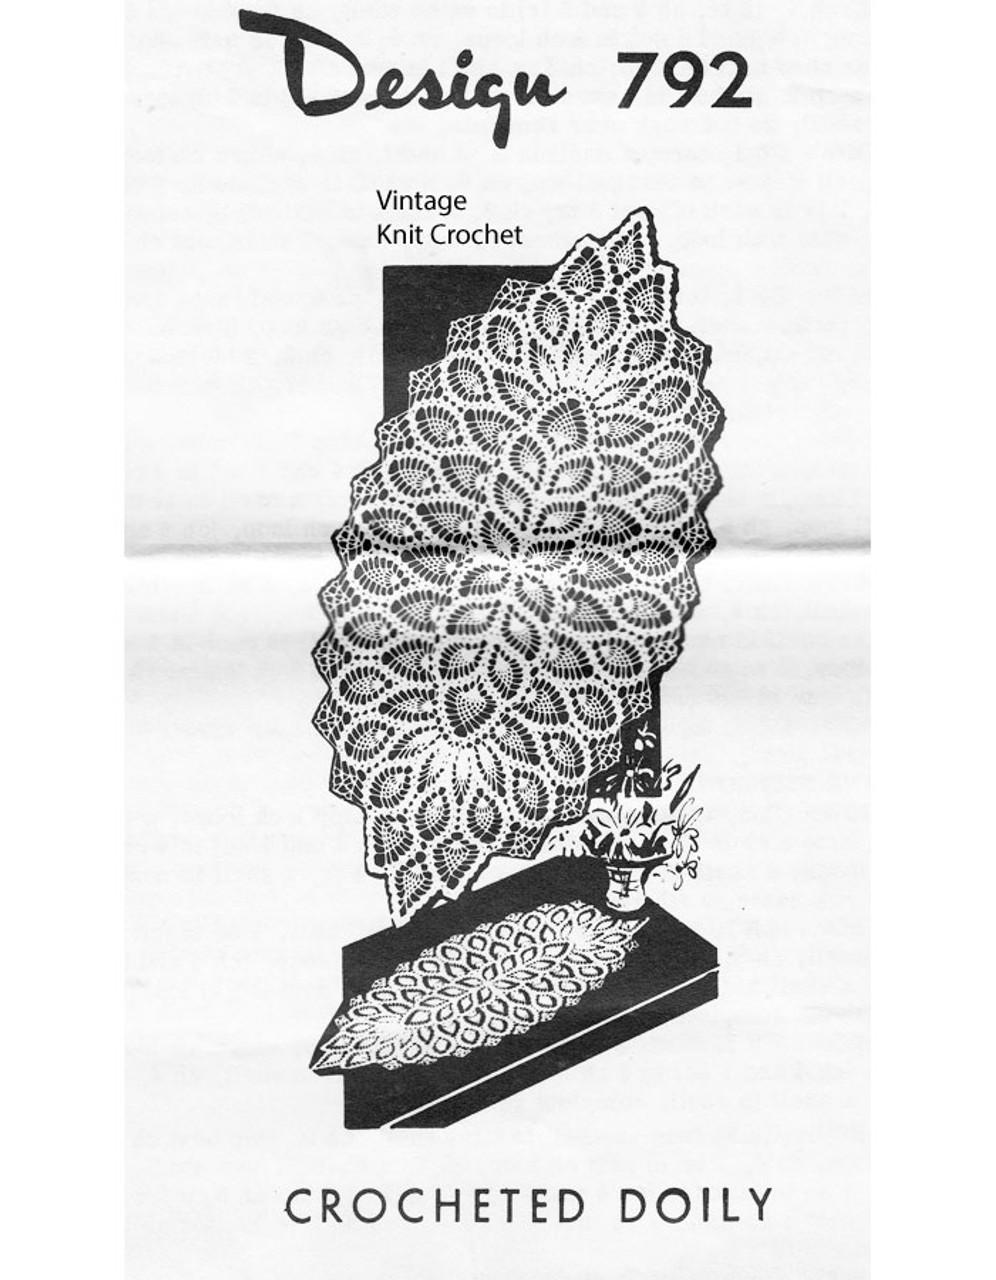 Oval Crochet Pineapple Doily Pattern Design 792